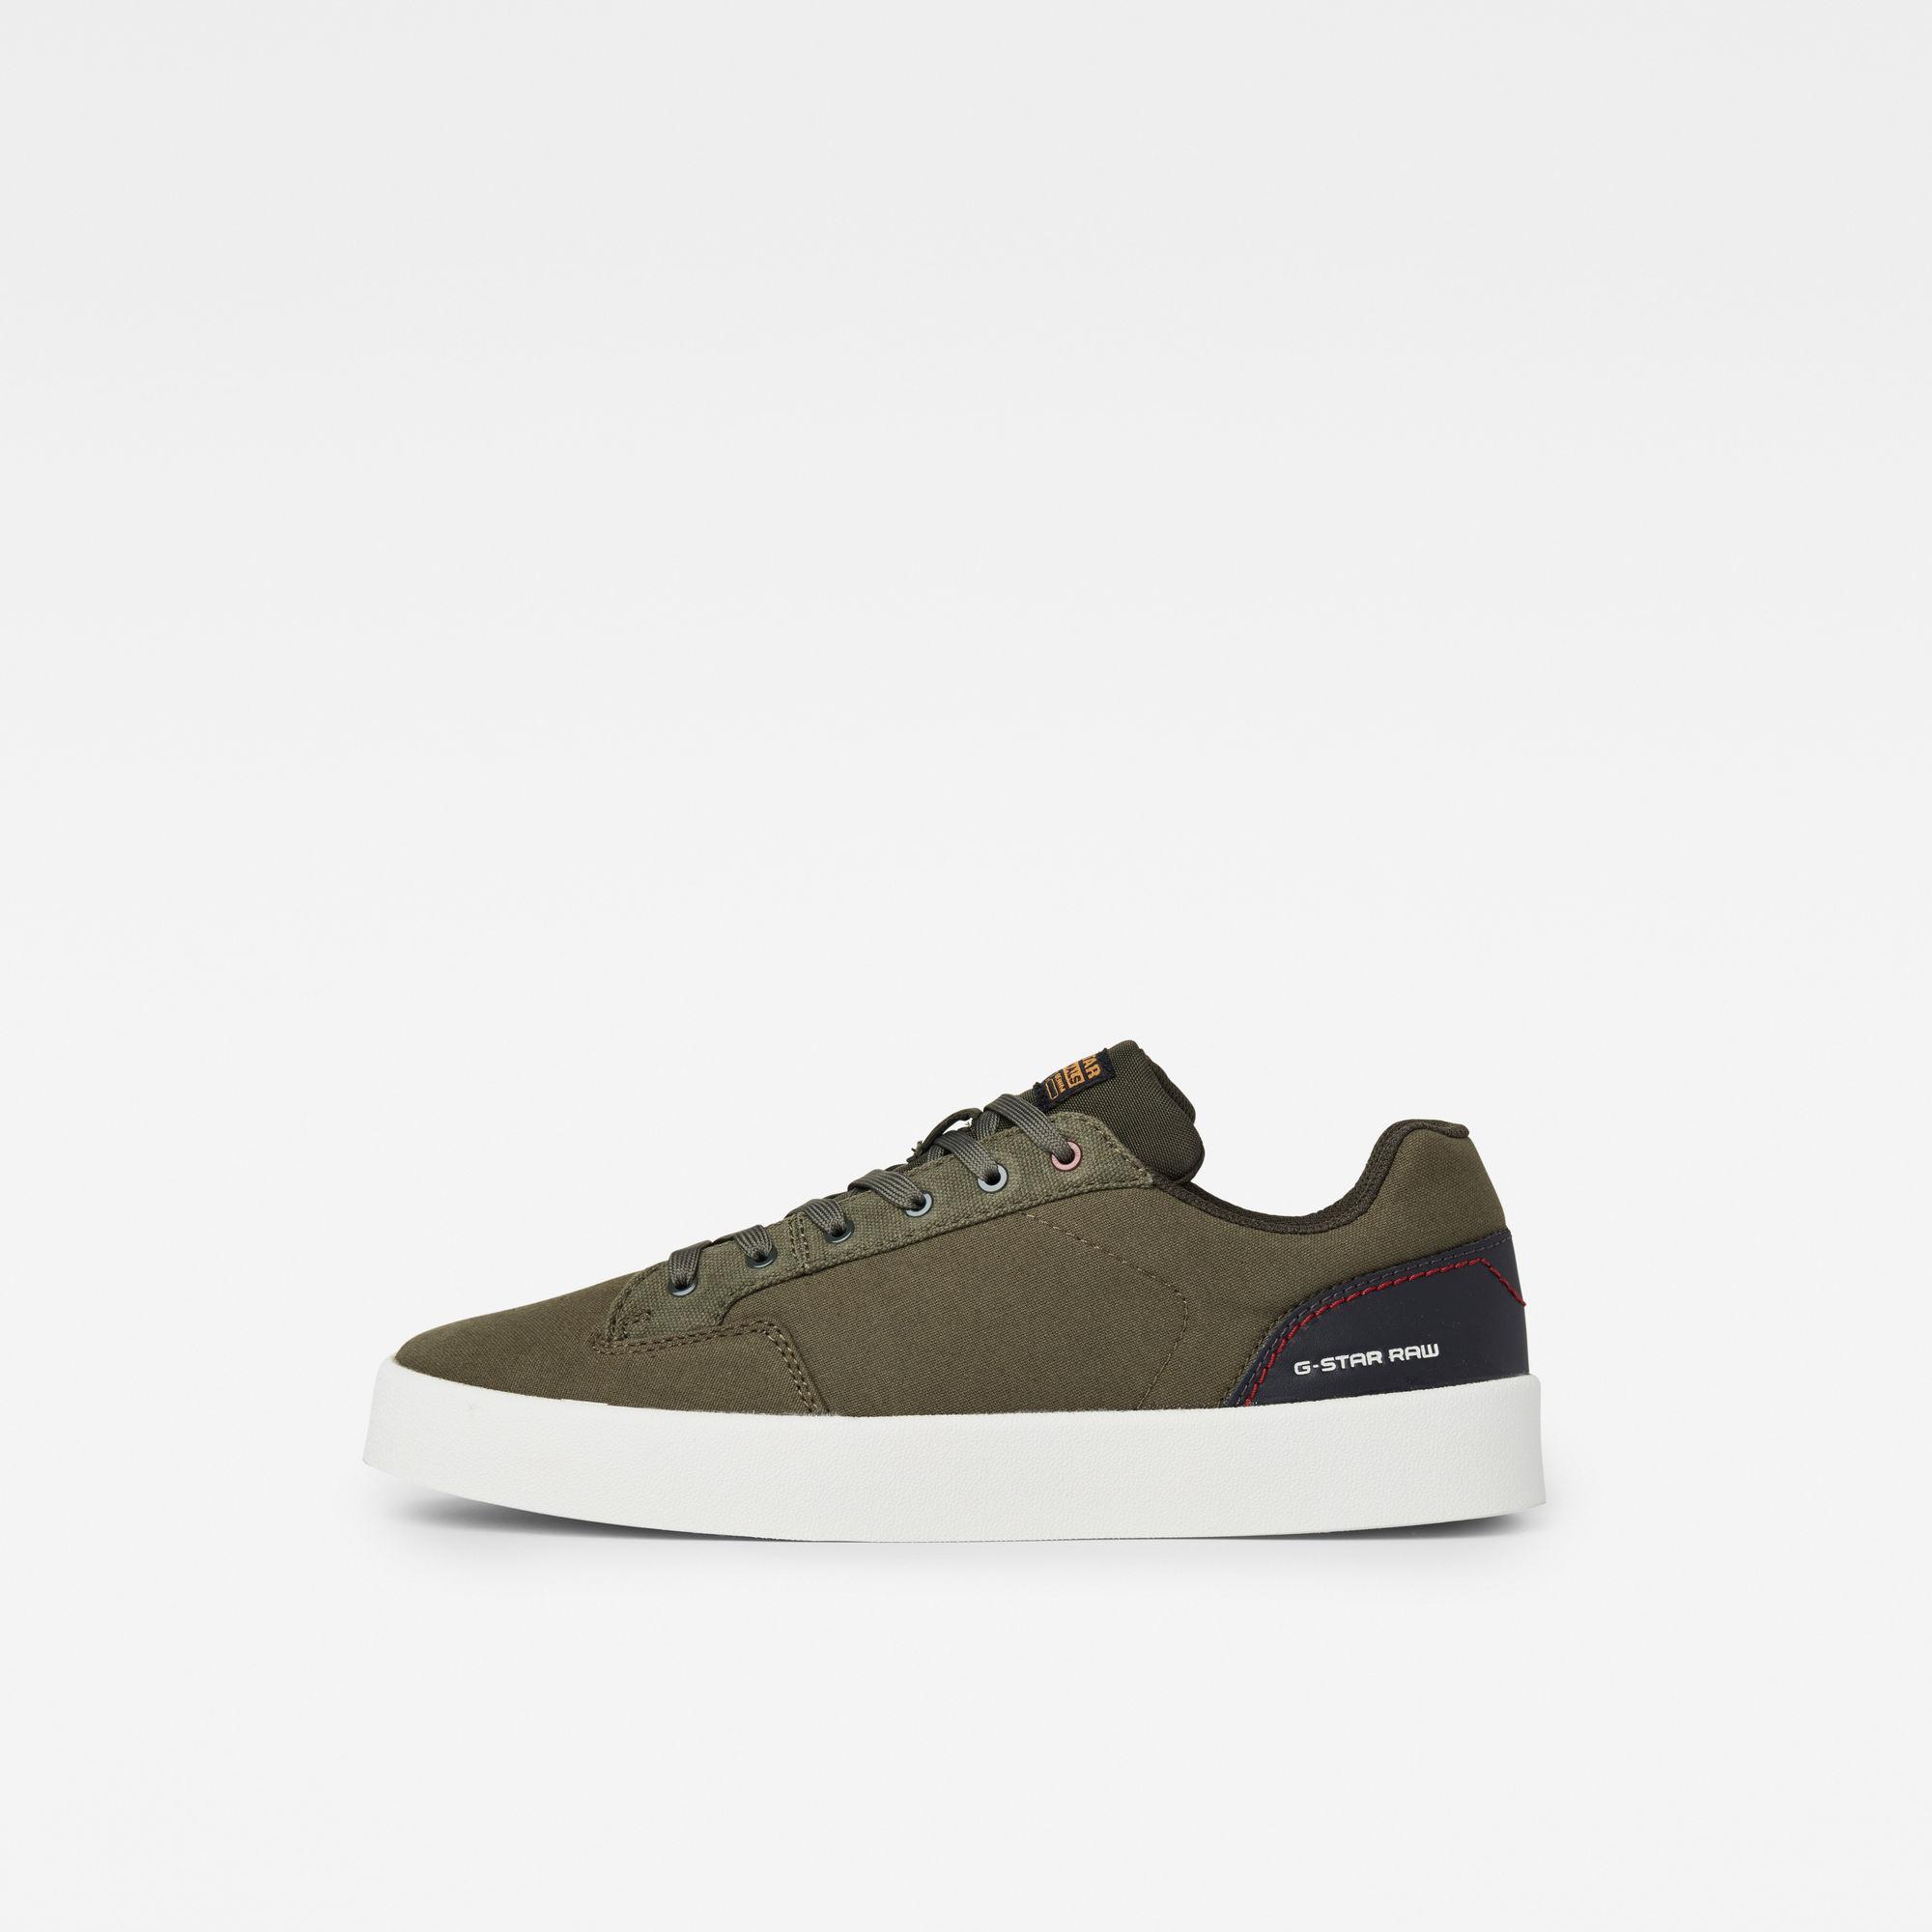 G-Star RAW Heren Ozone Sneakers Groen